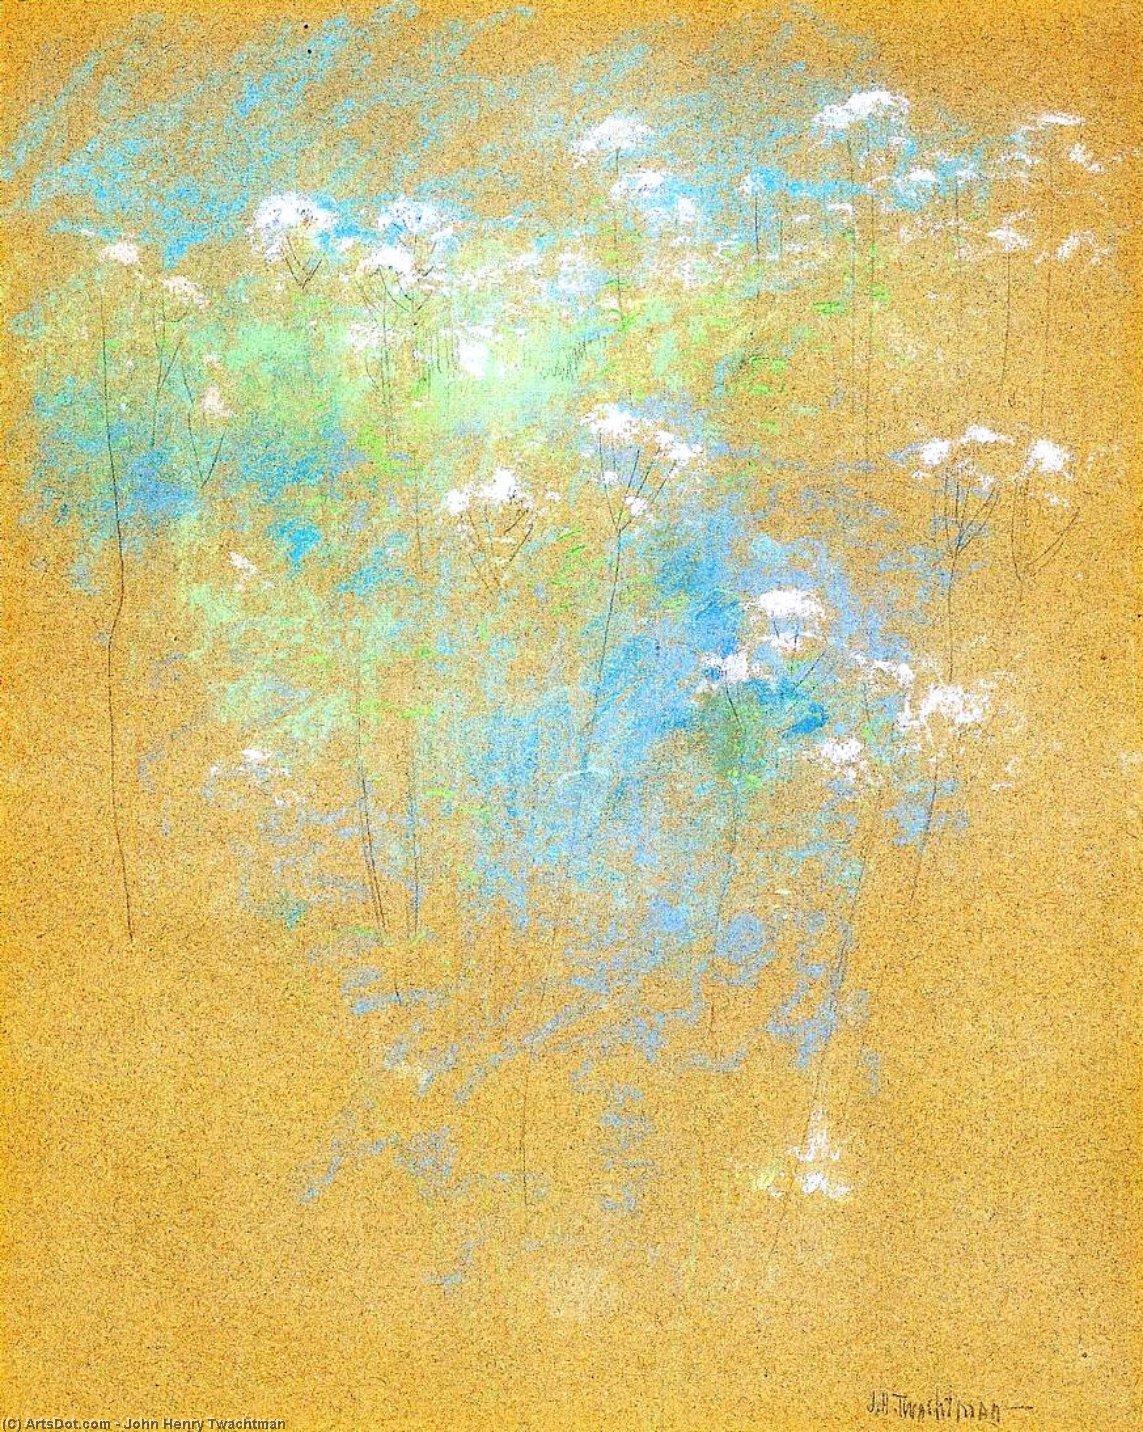 Wikioo.org - The Encyclopedia of Fine Arts - Painting, Artwork by John Henry Twachtman - Flowers